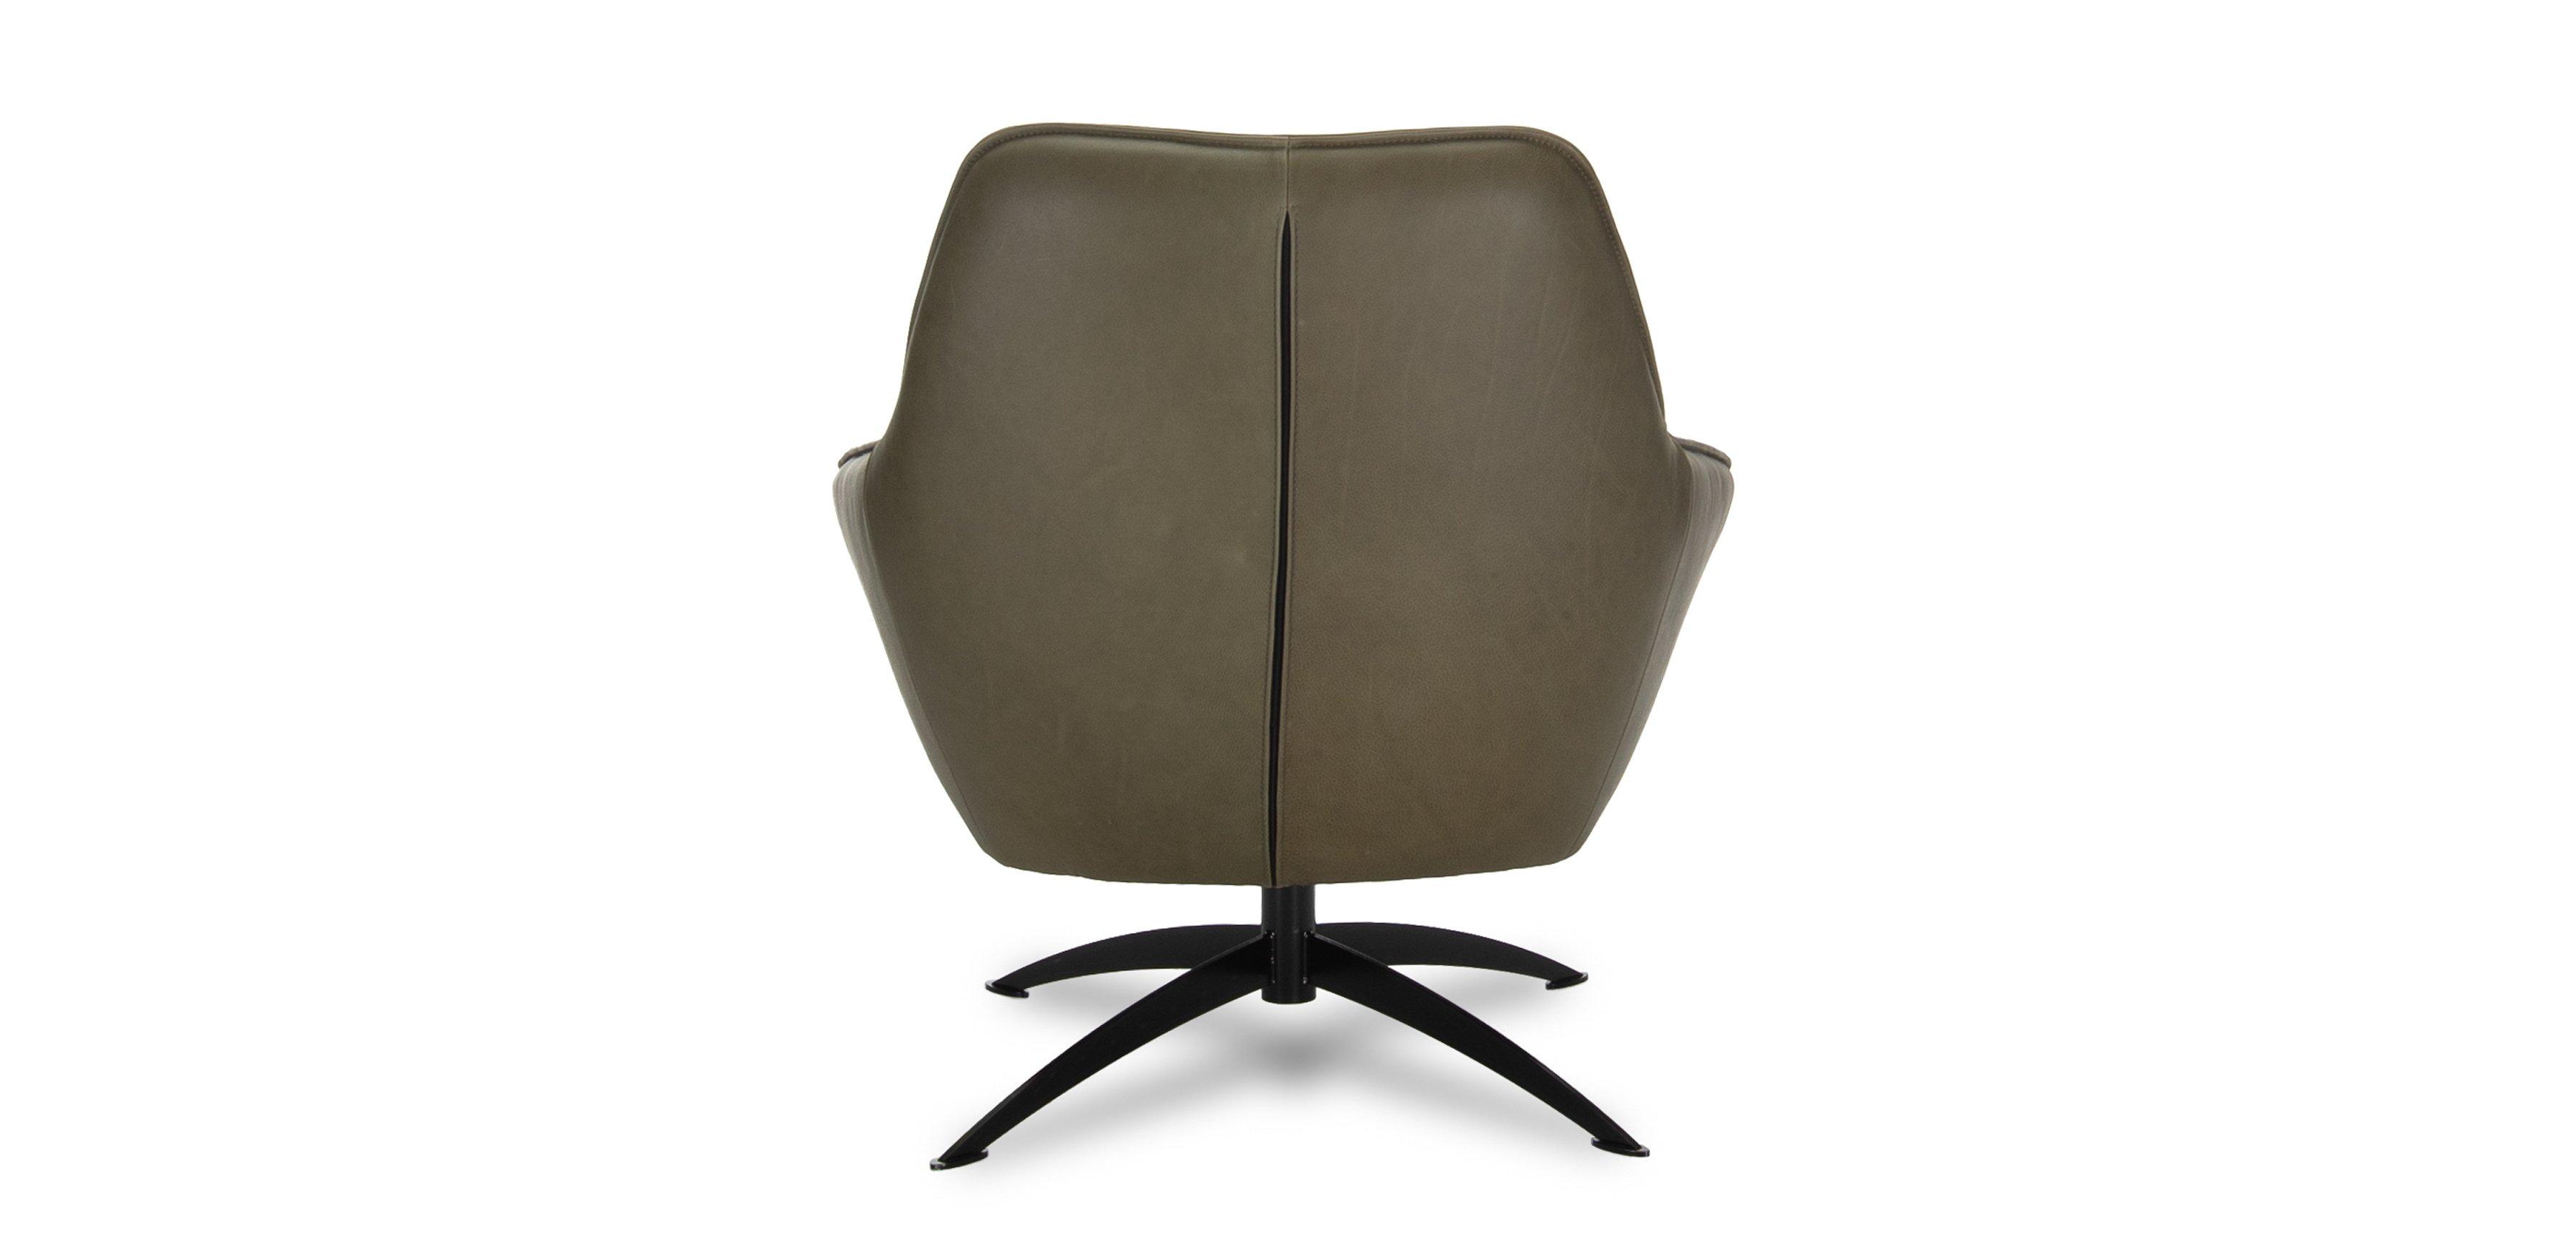 Faas fauteuil DYYK 3580x1750 leer 6